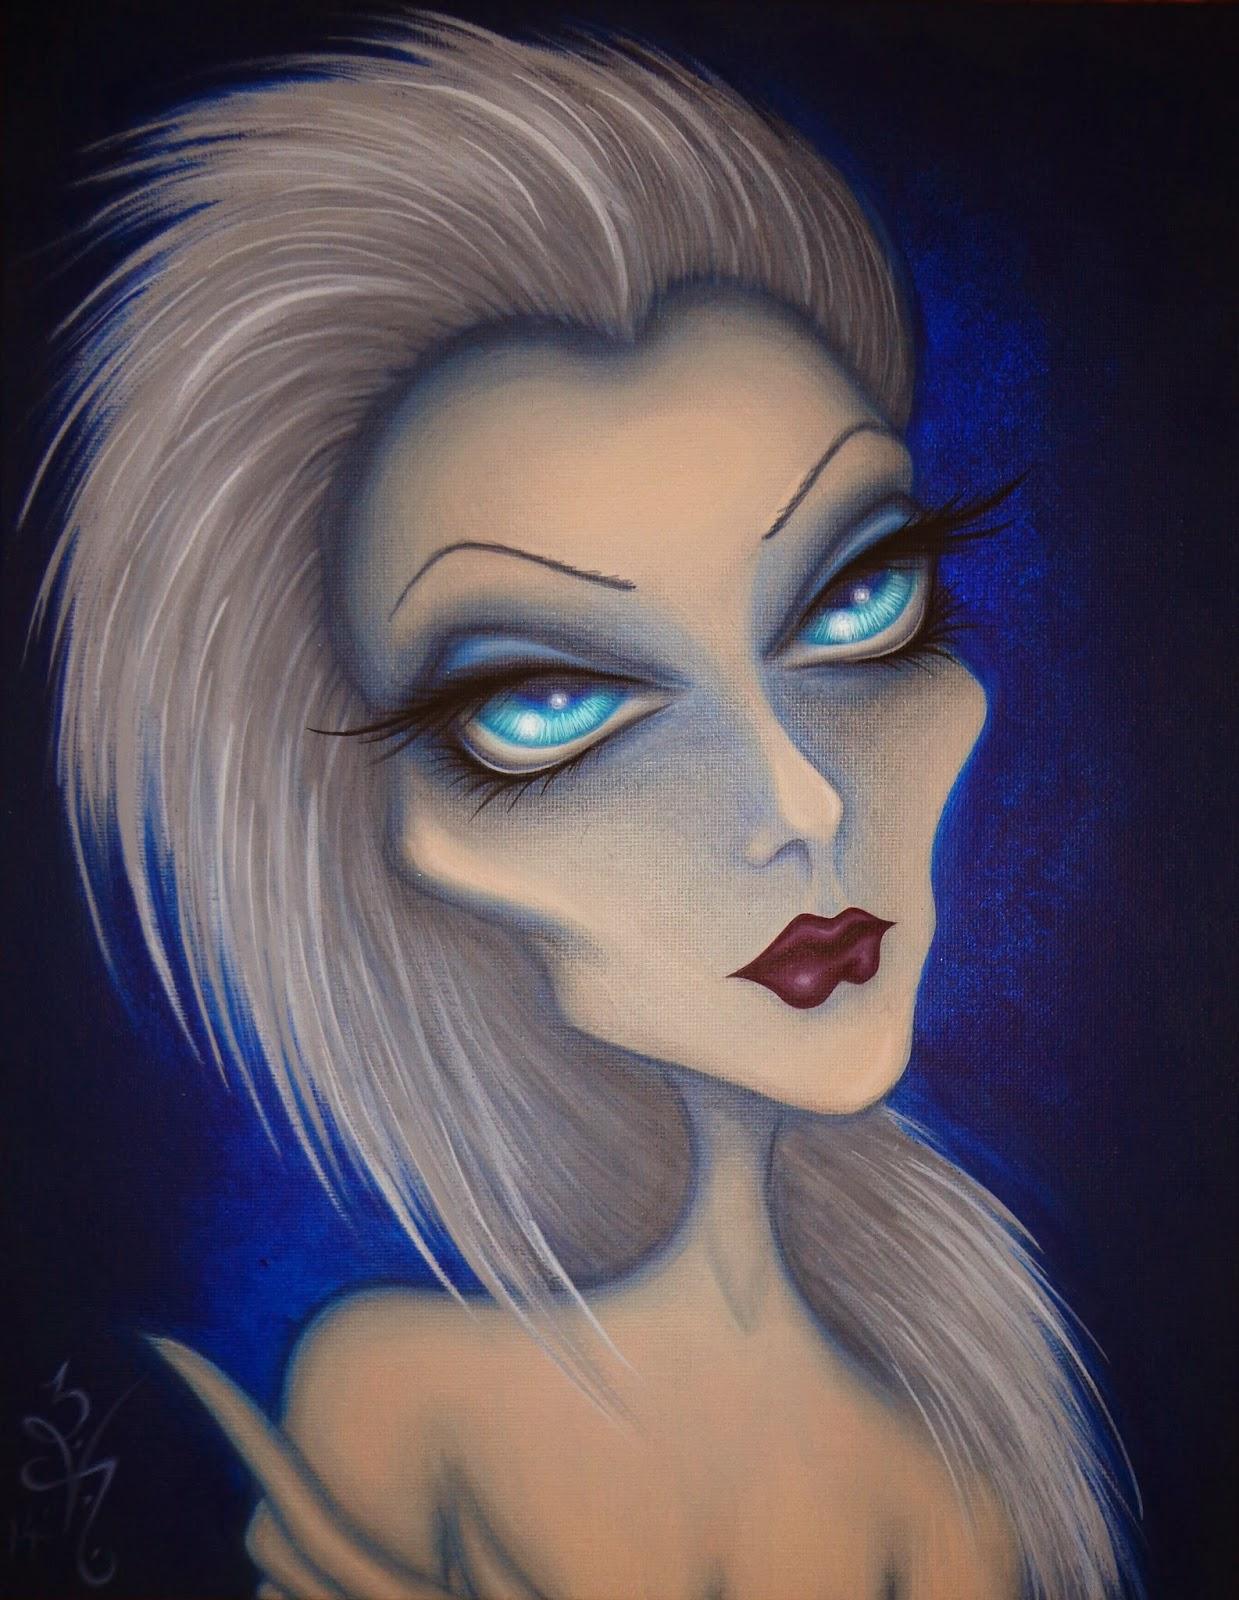 https://www.etsy.com/listing/207996198/original-fantasy-lowbrow-woman-girl-face